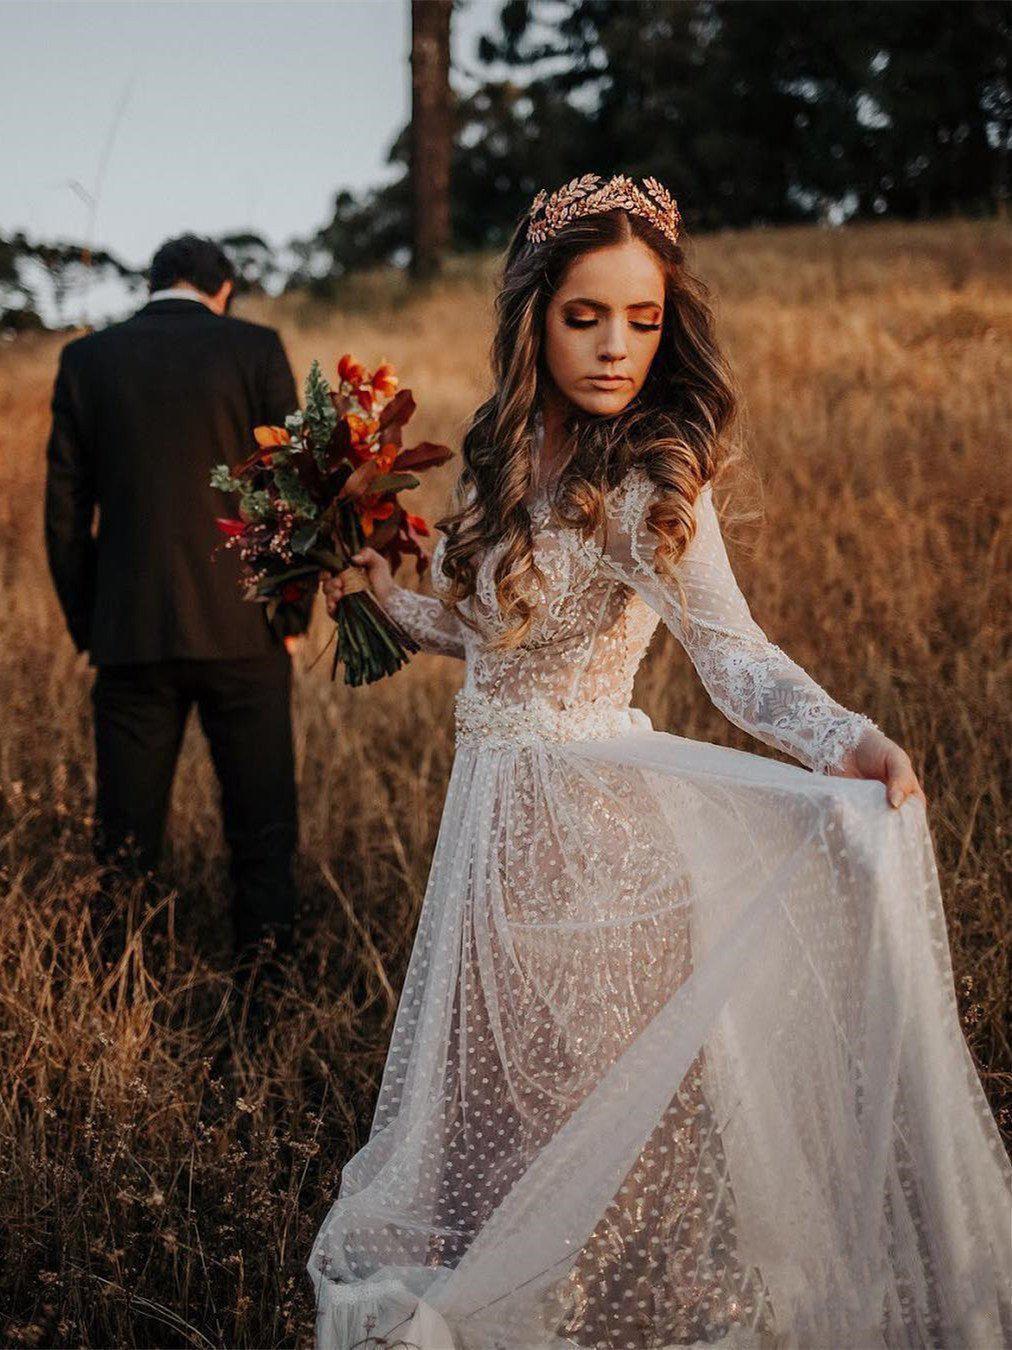 Long Sleeve Wedding Dresses V Neck Long Train Polka Dot Lace Open Back Boho Bridal Gown Jkw371 Boho Wedding Dress Lace Bohemian Boho Wedding Dress Lace Bohemian Wedding Dress Lace [ 1350 x 1012 Pixel ]